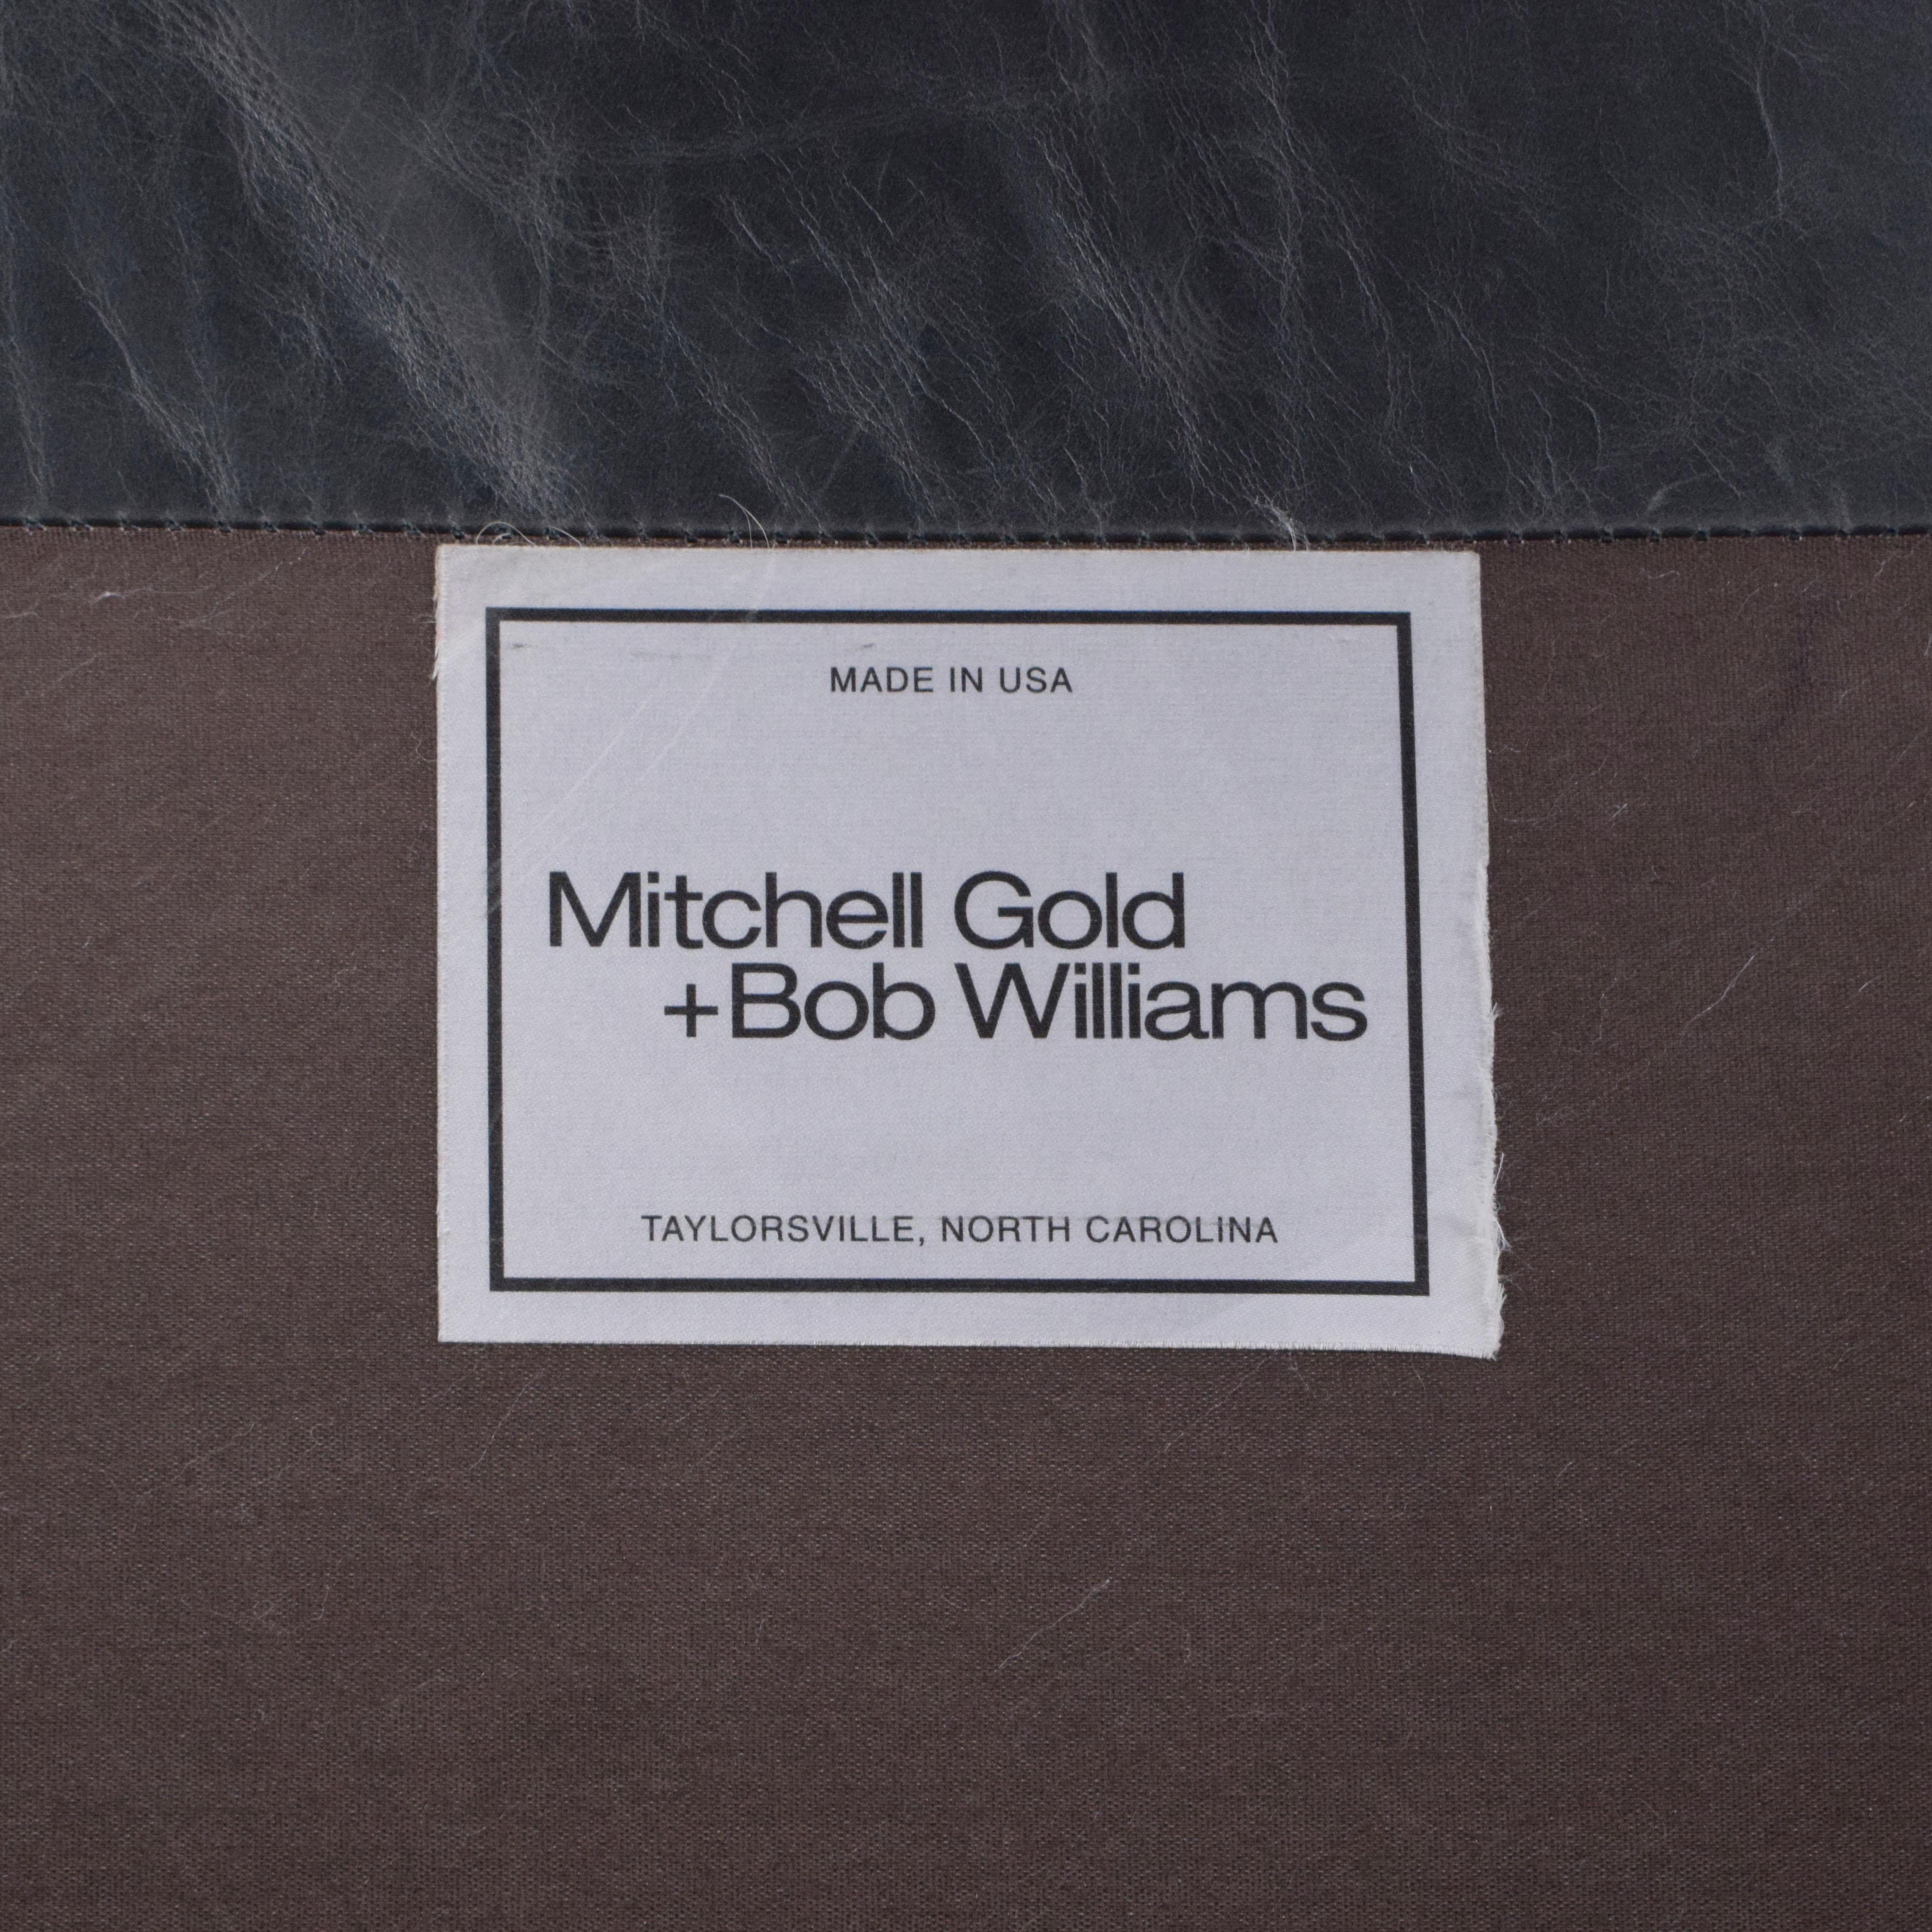 buy Mitchell Gold + Bob Williams Ottoman Mitchell Gold + Bob Williams